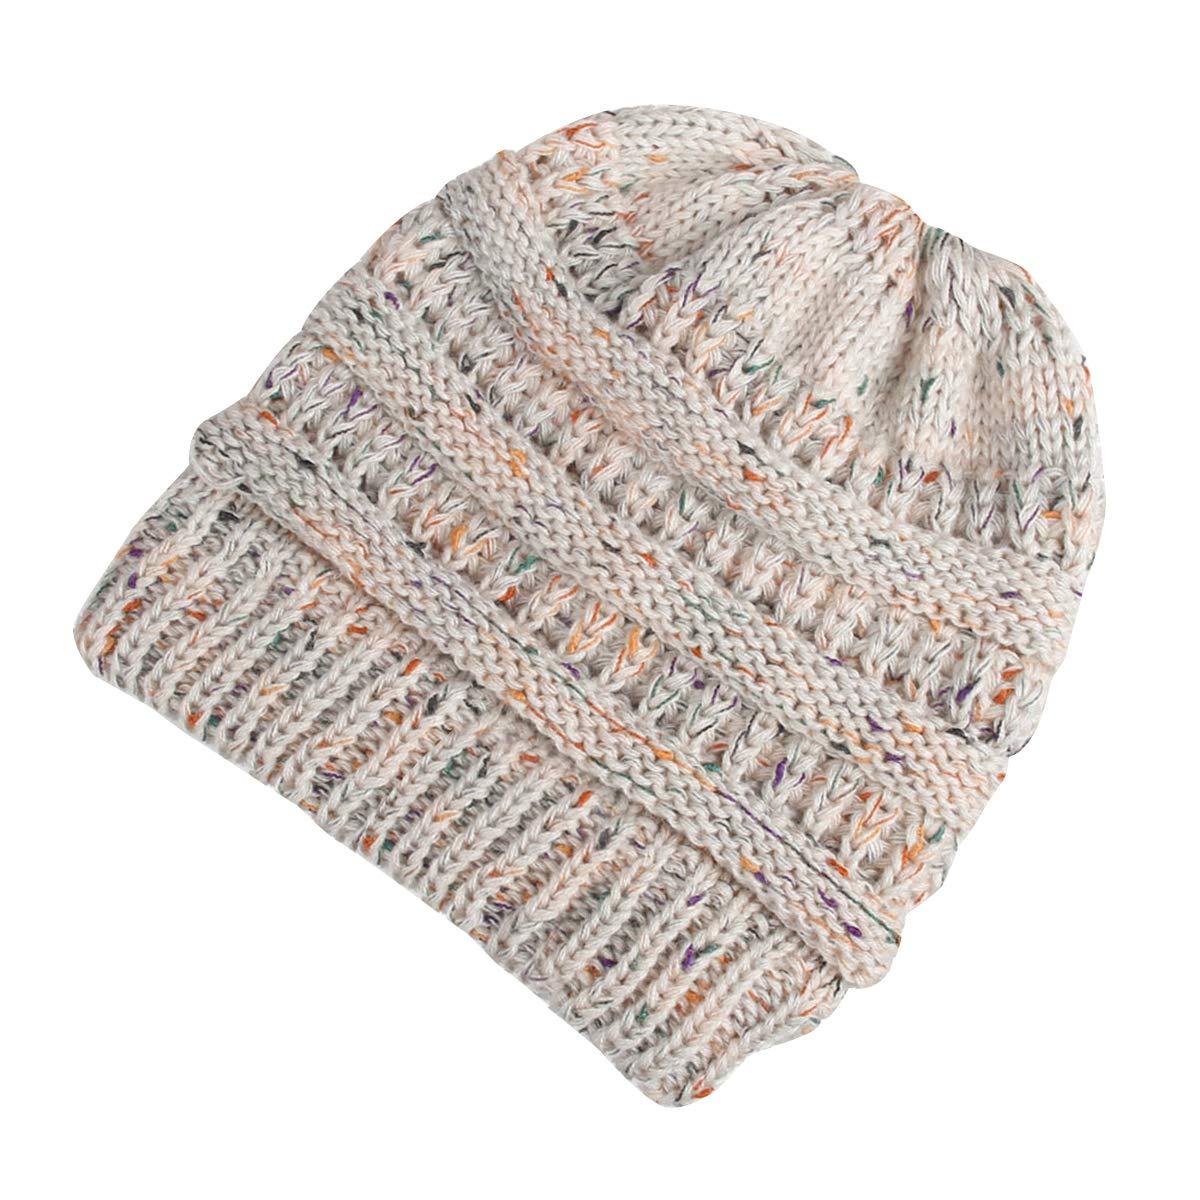 Ehpow Damen Plain Ponytail Messy Bun Gerippte Winter Beanie Hut Cap Hair Hairband